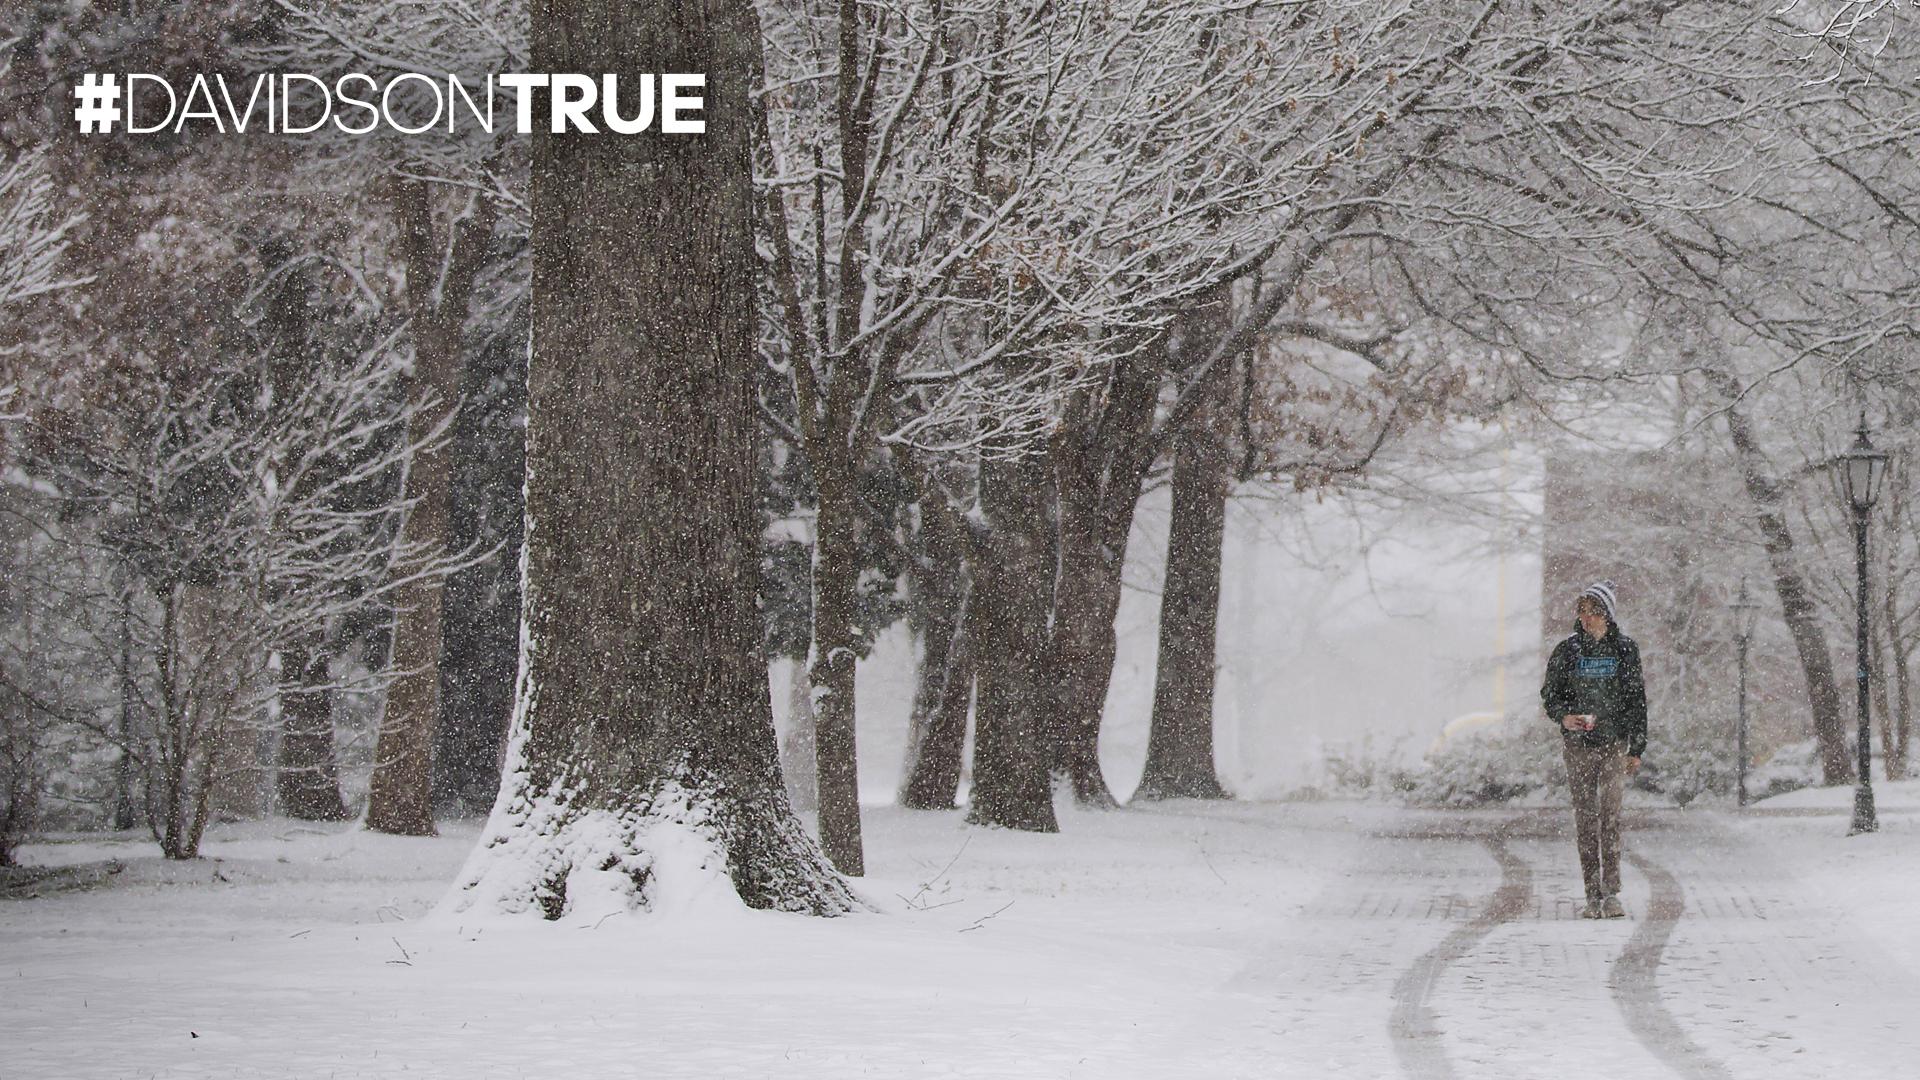 Student walking along snowy path and Davidson True wordmark